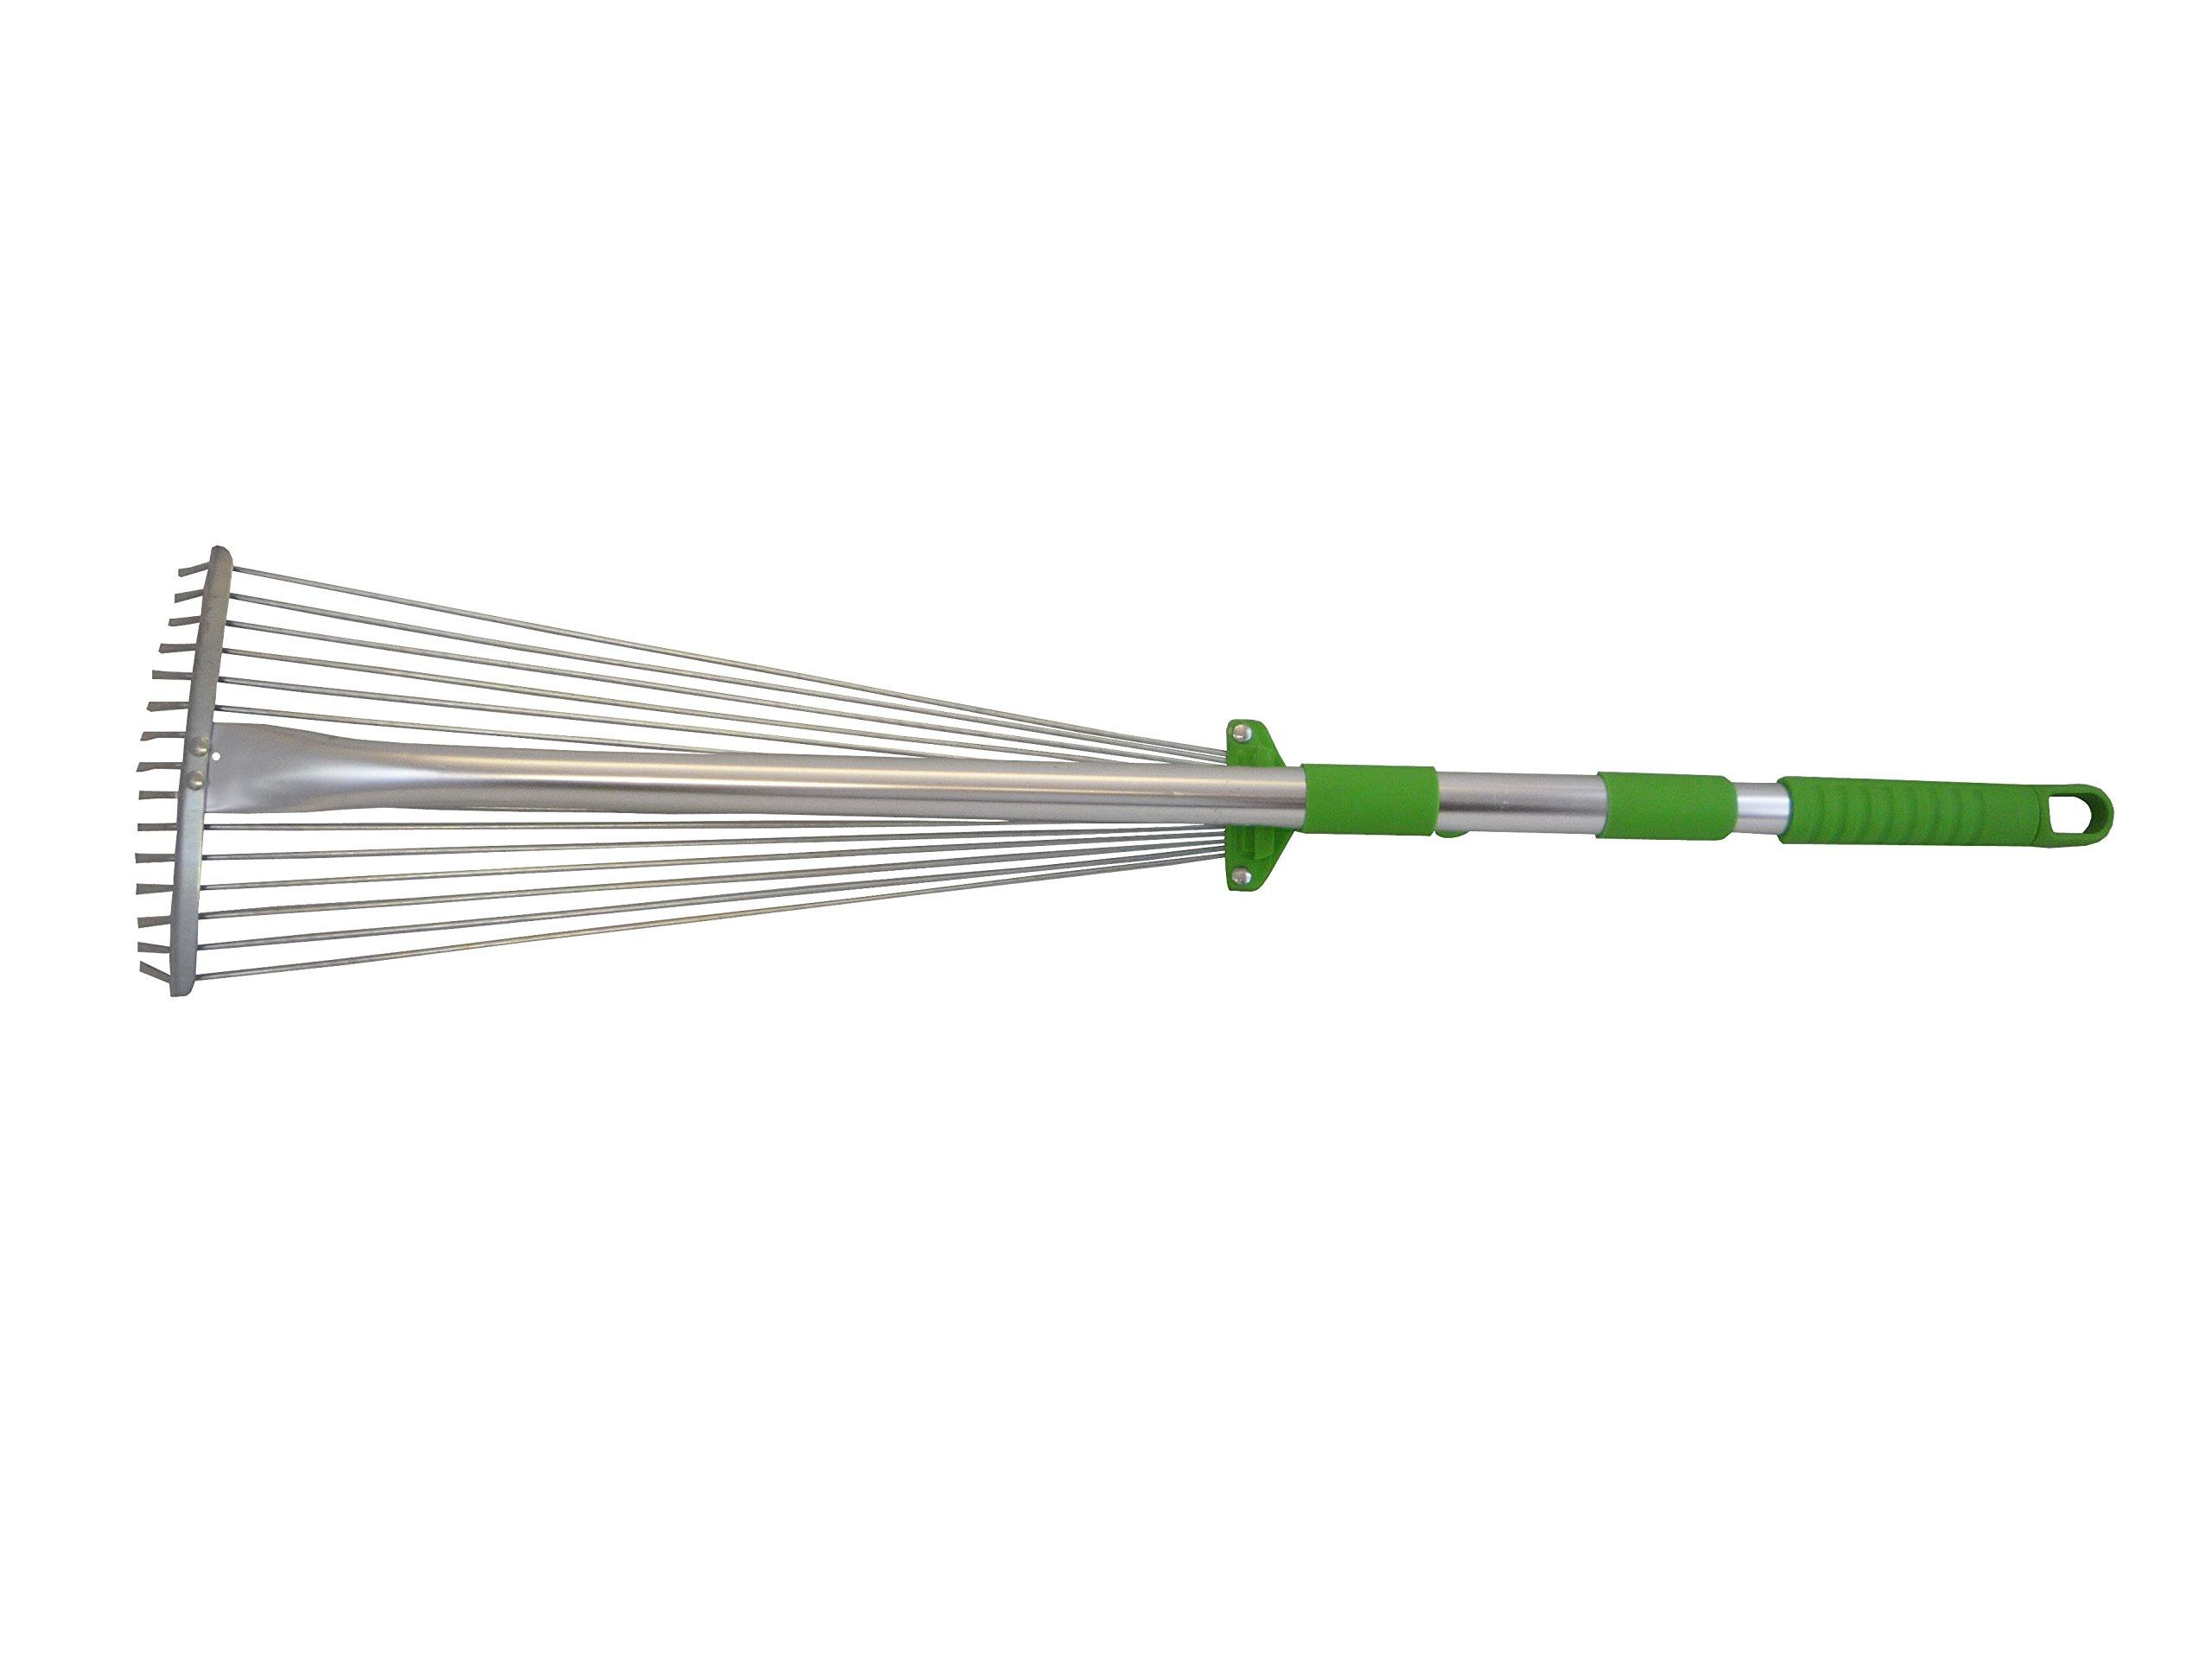 Tierra Garden 35-1812 Stainless Steel Adjustable and Telescopic Rake